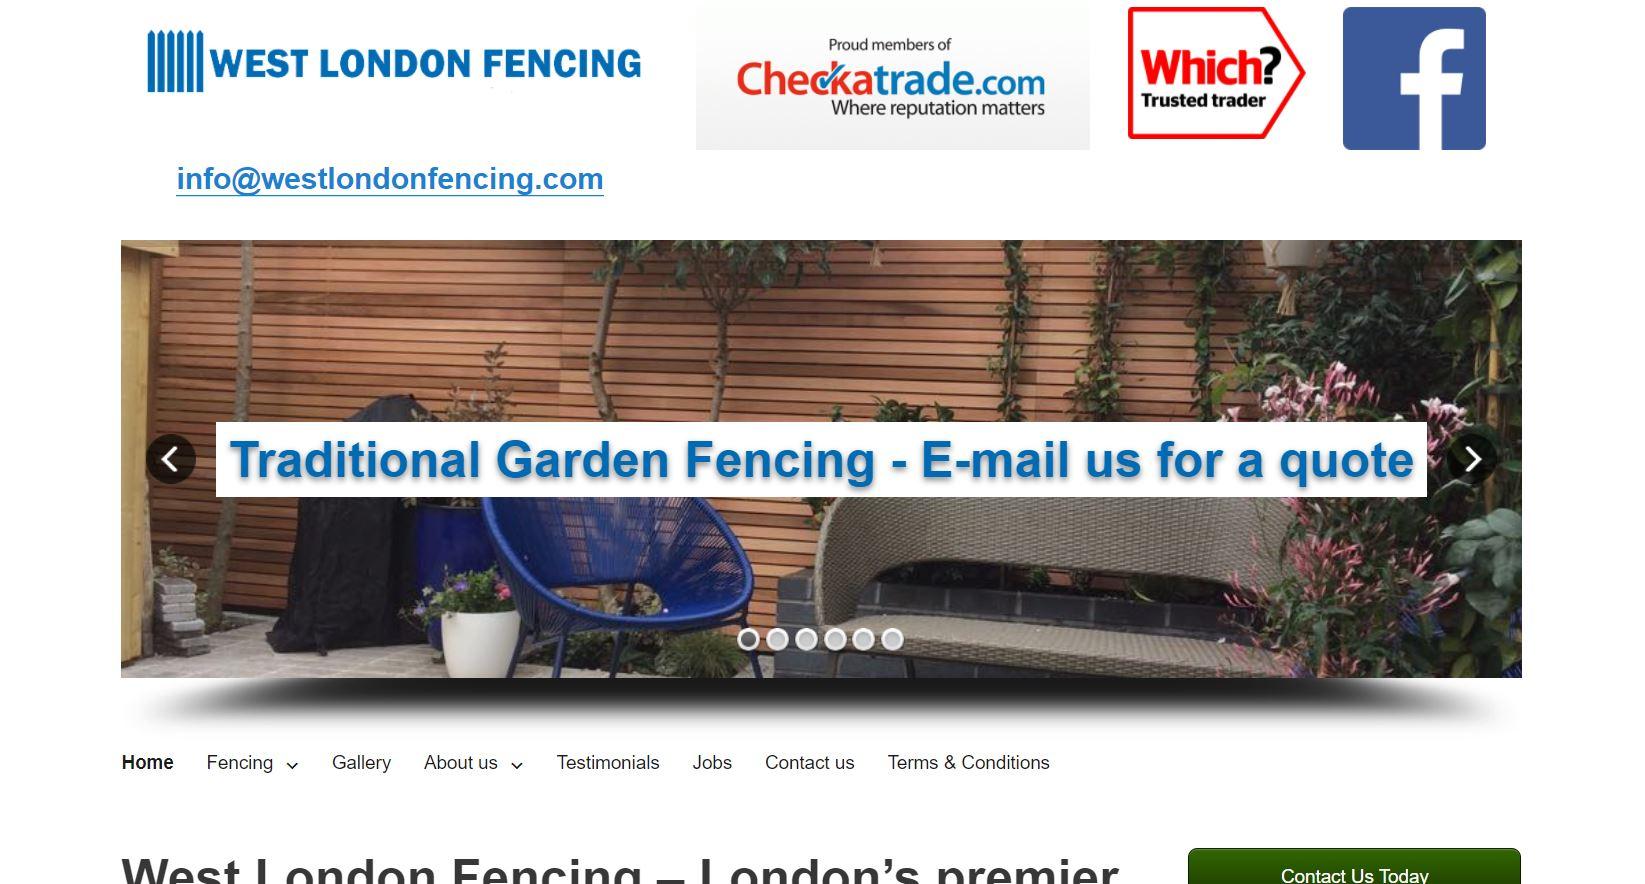 West London Fencing